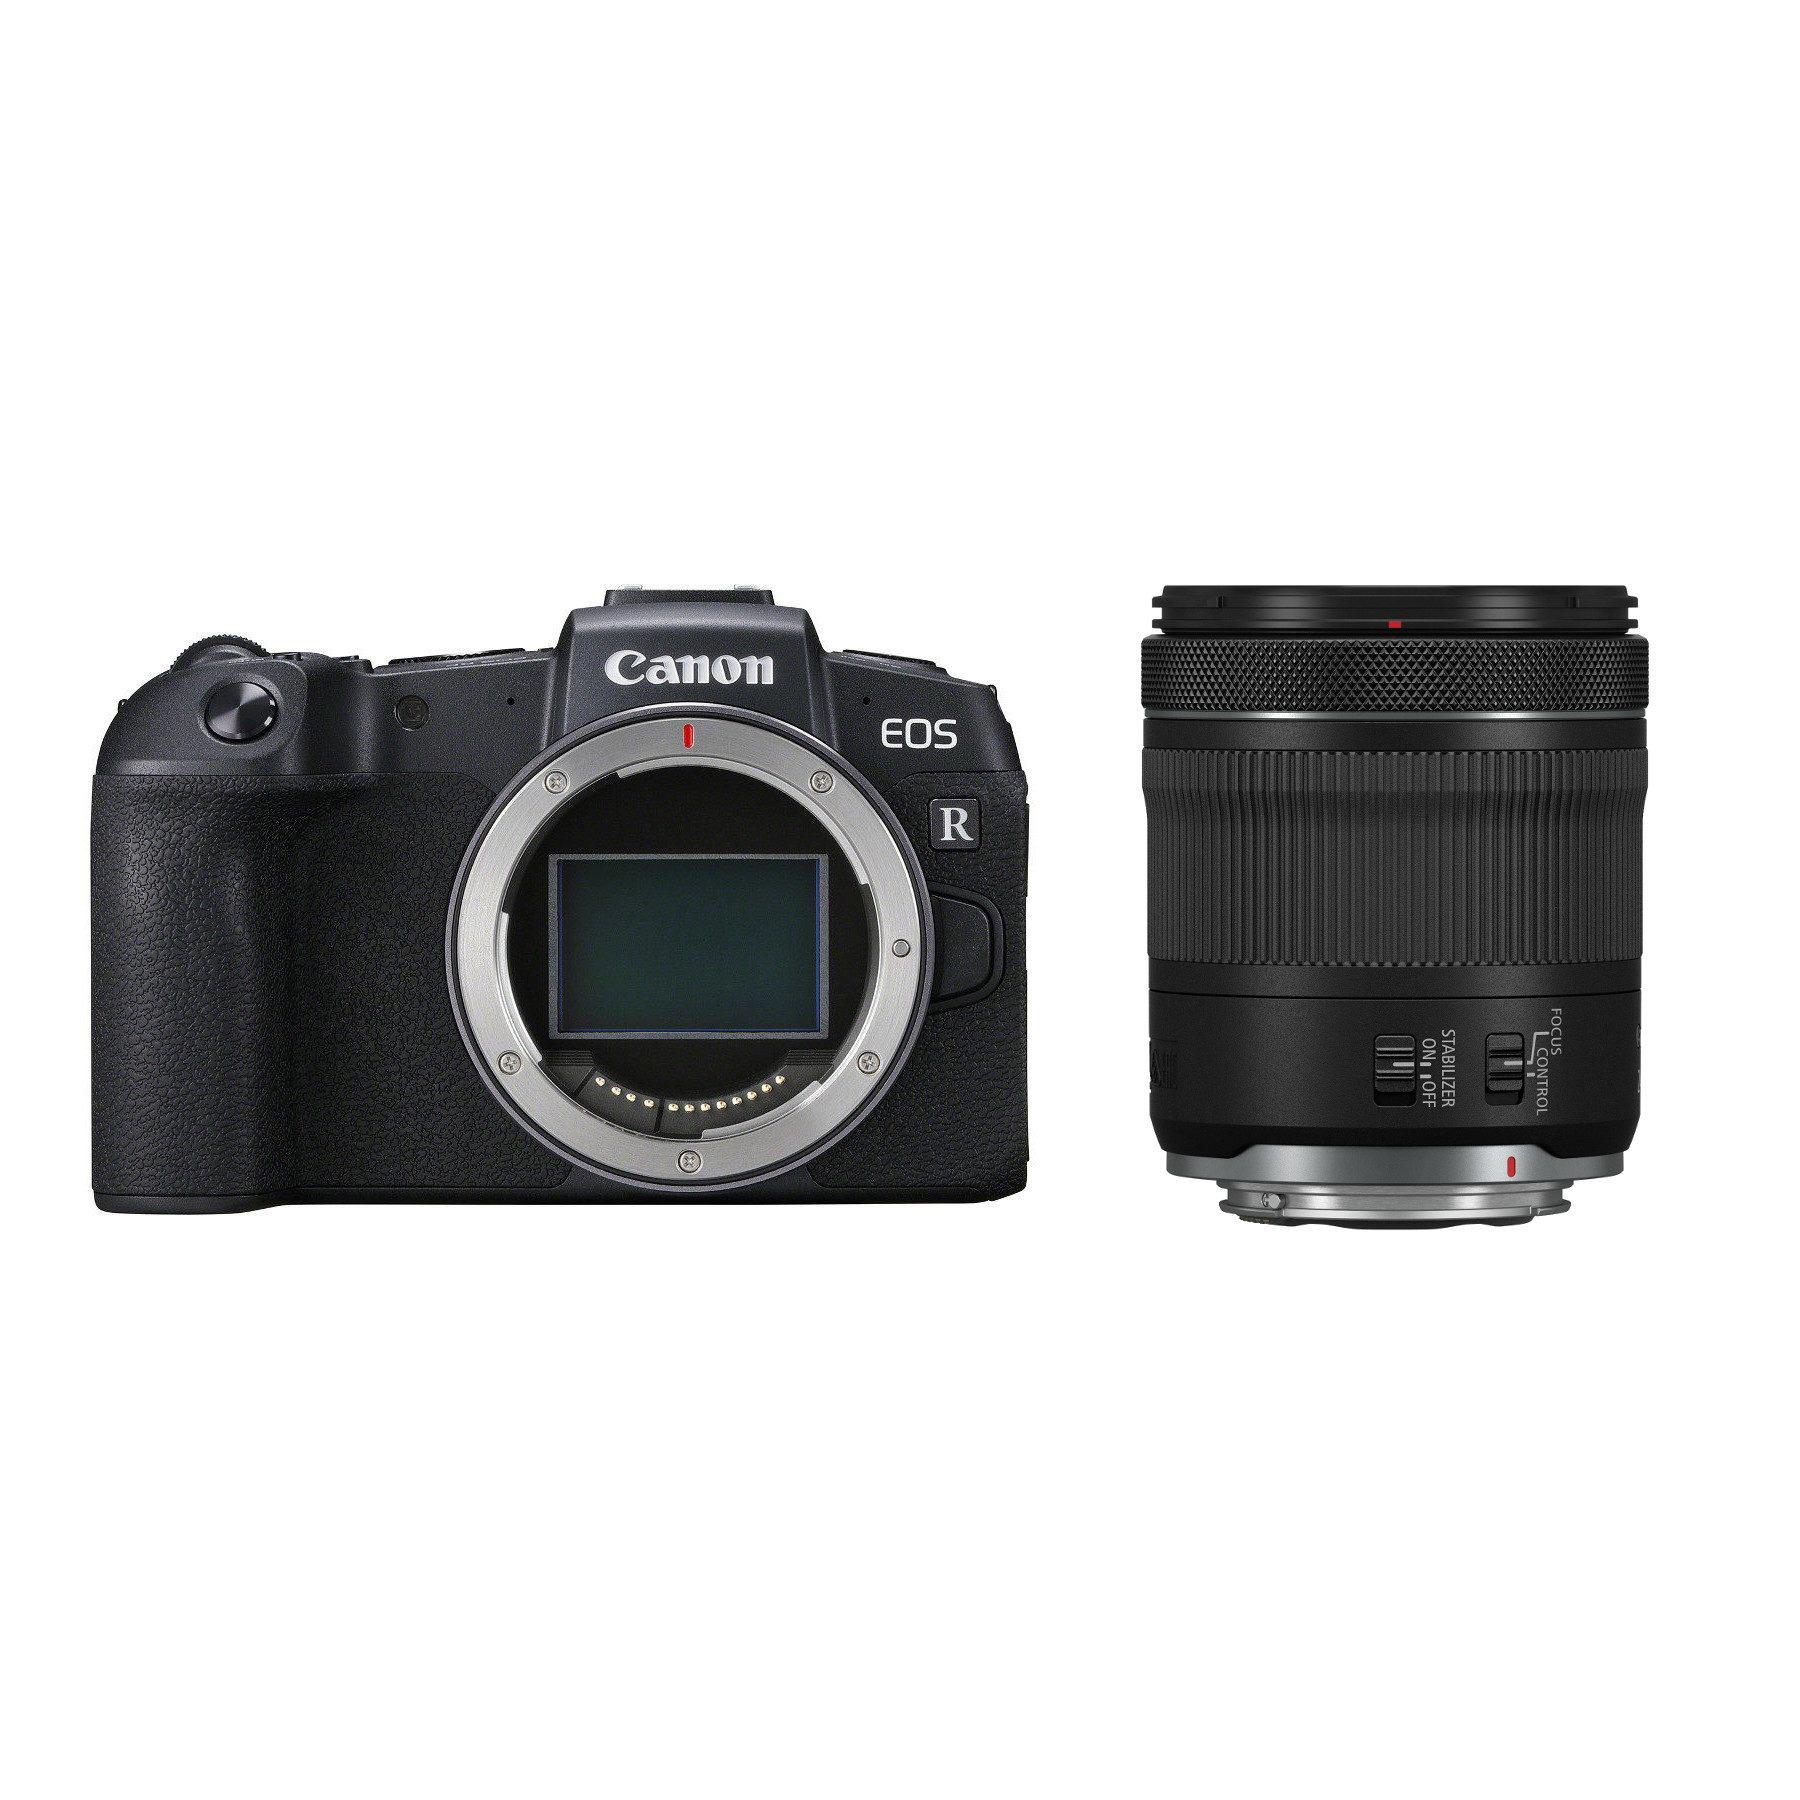 Canon EOS RP systeemcamera Zwart + RF 24-105mm f/4-7.1 IS STM <br/>€ 1199.00 <br/> <a href='https://www.cameranu.nl/fotografie/?tt=12190_474631_241358_&r=https%3A%2F%2Fwww.cameranu.nl%2Fnl%2Fp3172687%2Fcanon-eos-rp-systeemcamera-zwart-rf-24-105mm-f-4-7-1-is-stm%3Fchannable%3D002a59696400333137323638371c%26utm_campaign%3D%26utm_content%3DCanon%2Bpro%2Bcamera%26utm_source%3DTradetracker%26utm_medium%3Dcpc%26utm_term%3DDigitale%2Bcamera%26apos%3Bs' target='_blank'>naar de winkel</a>